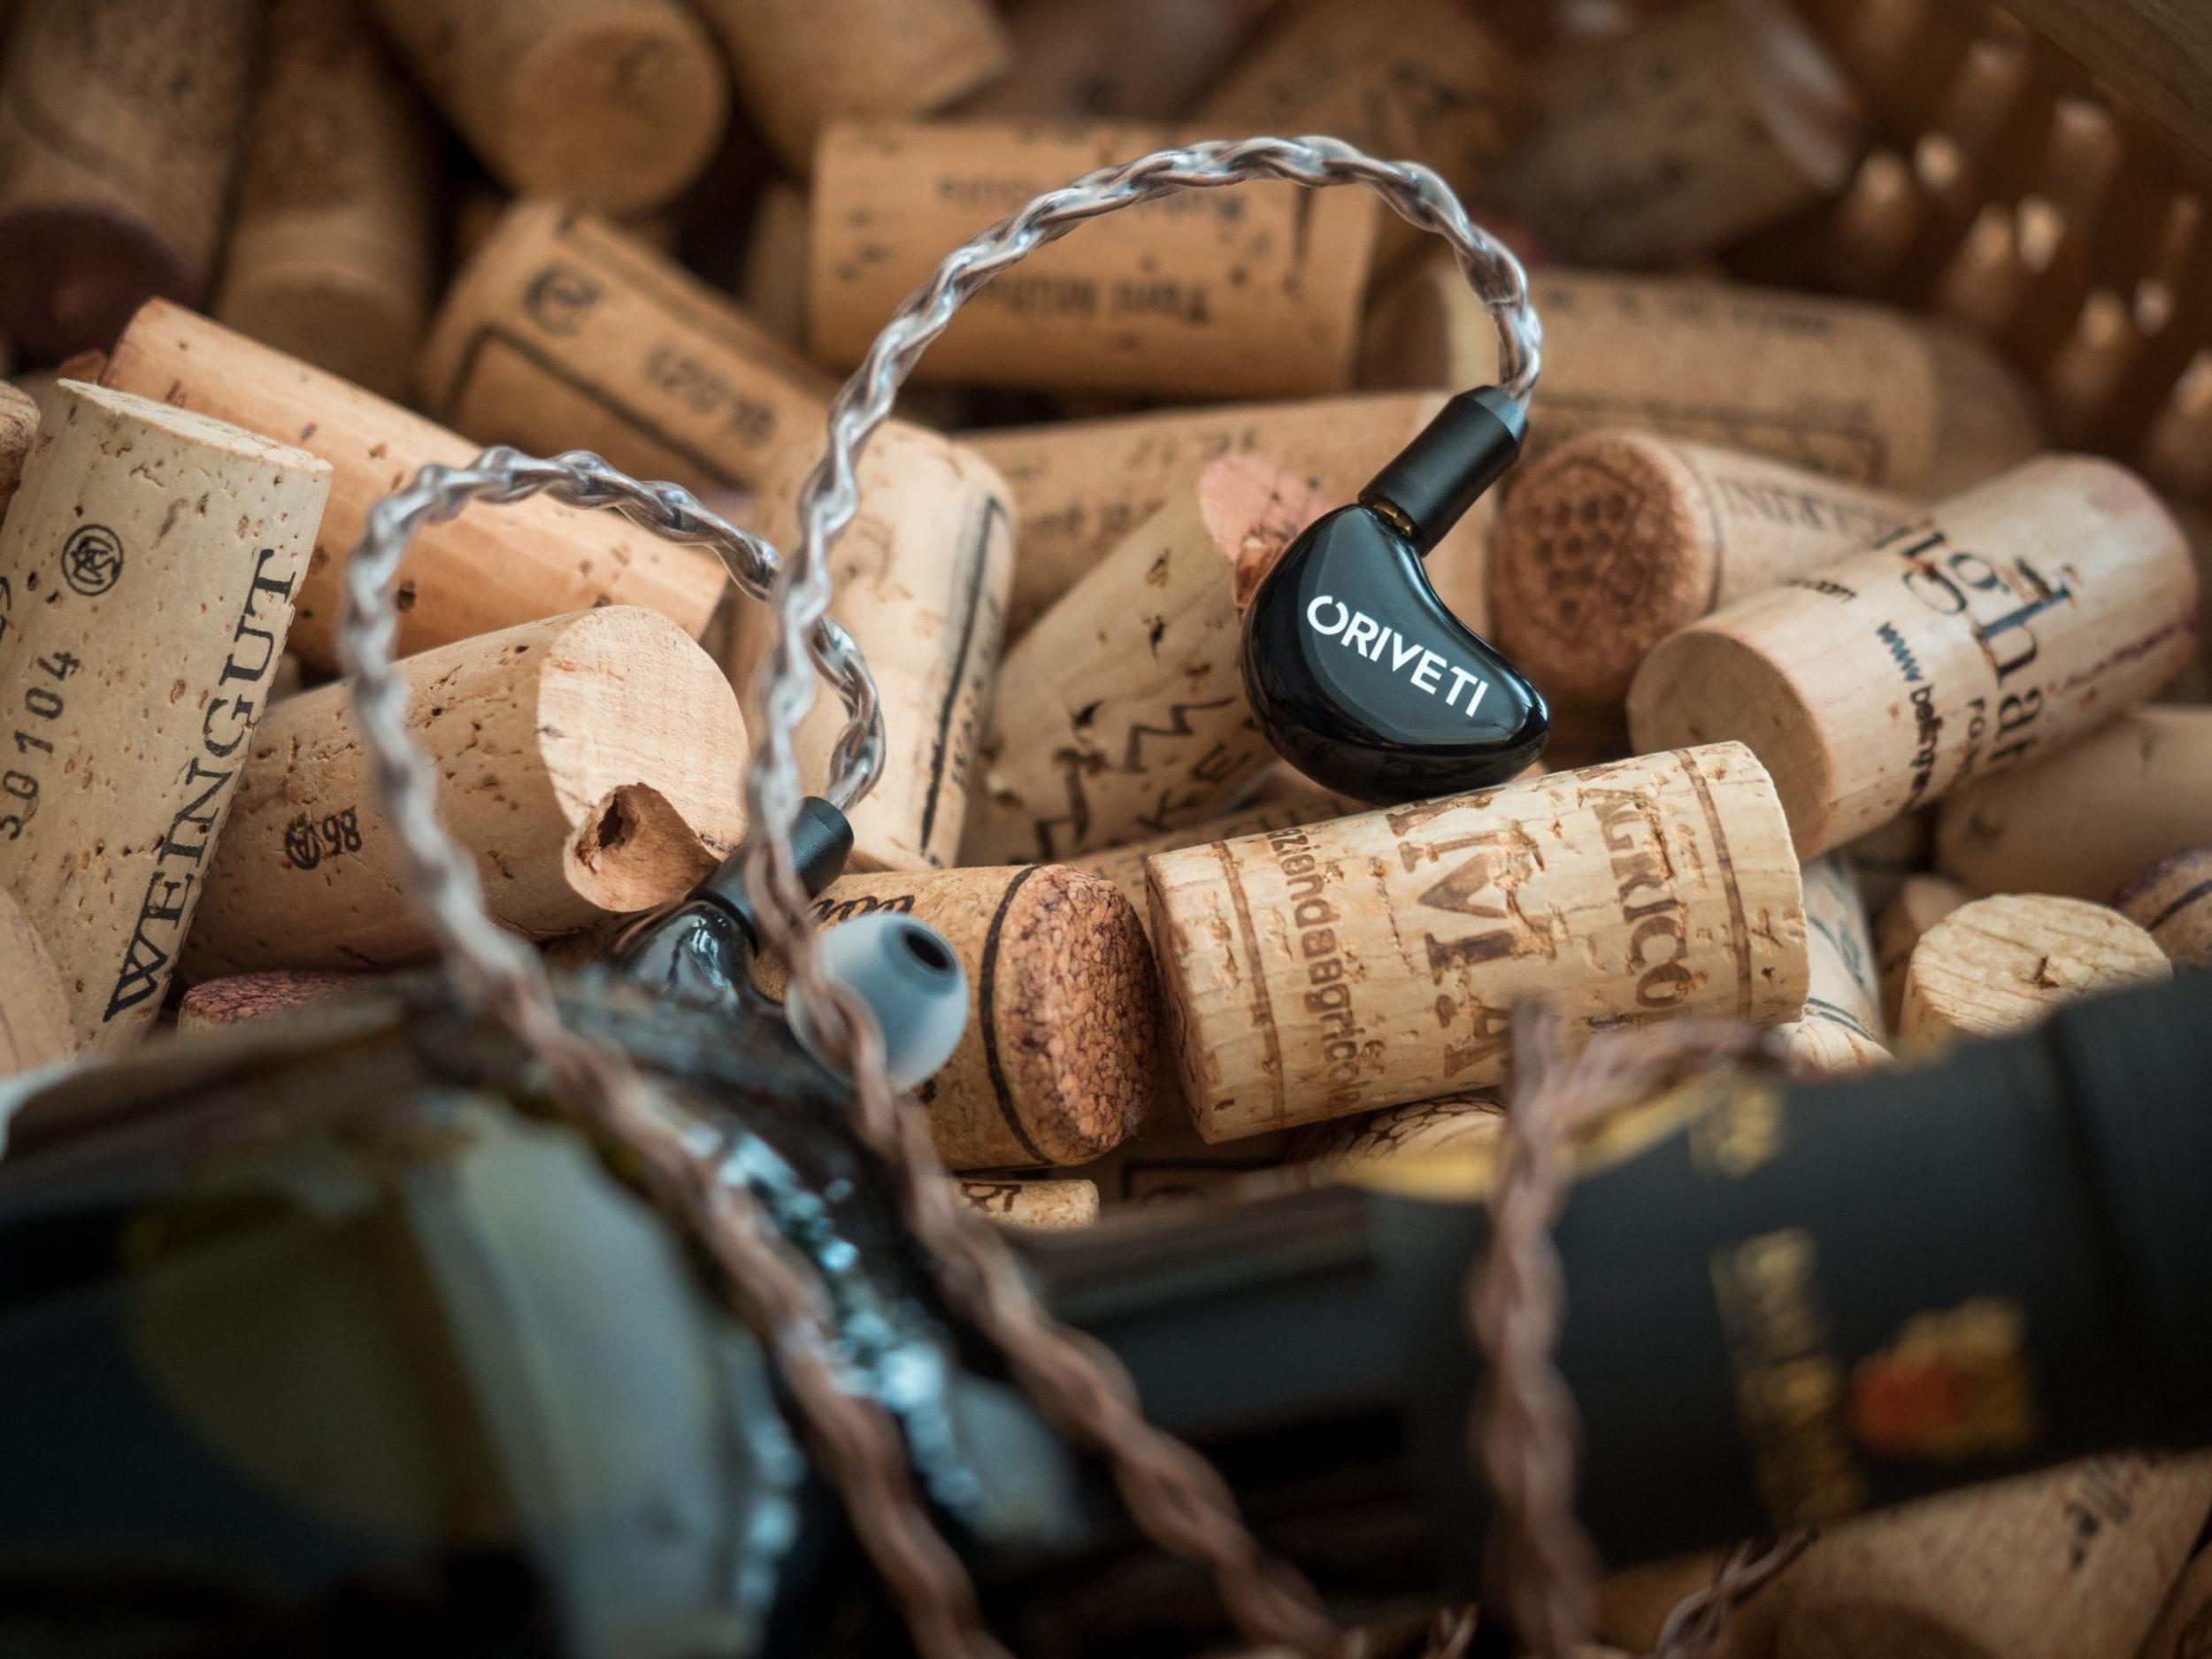 Wine and IEM